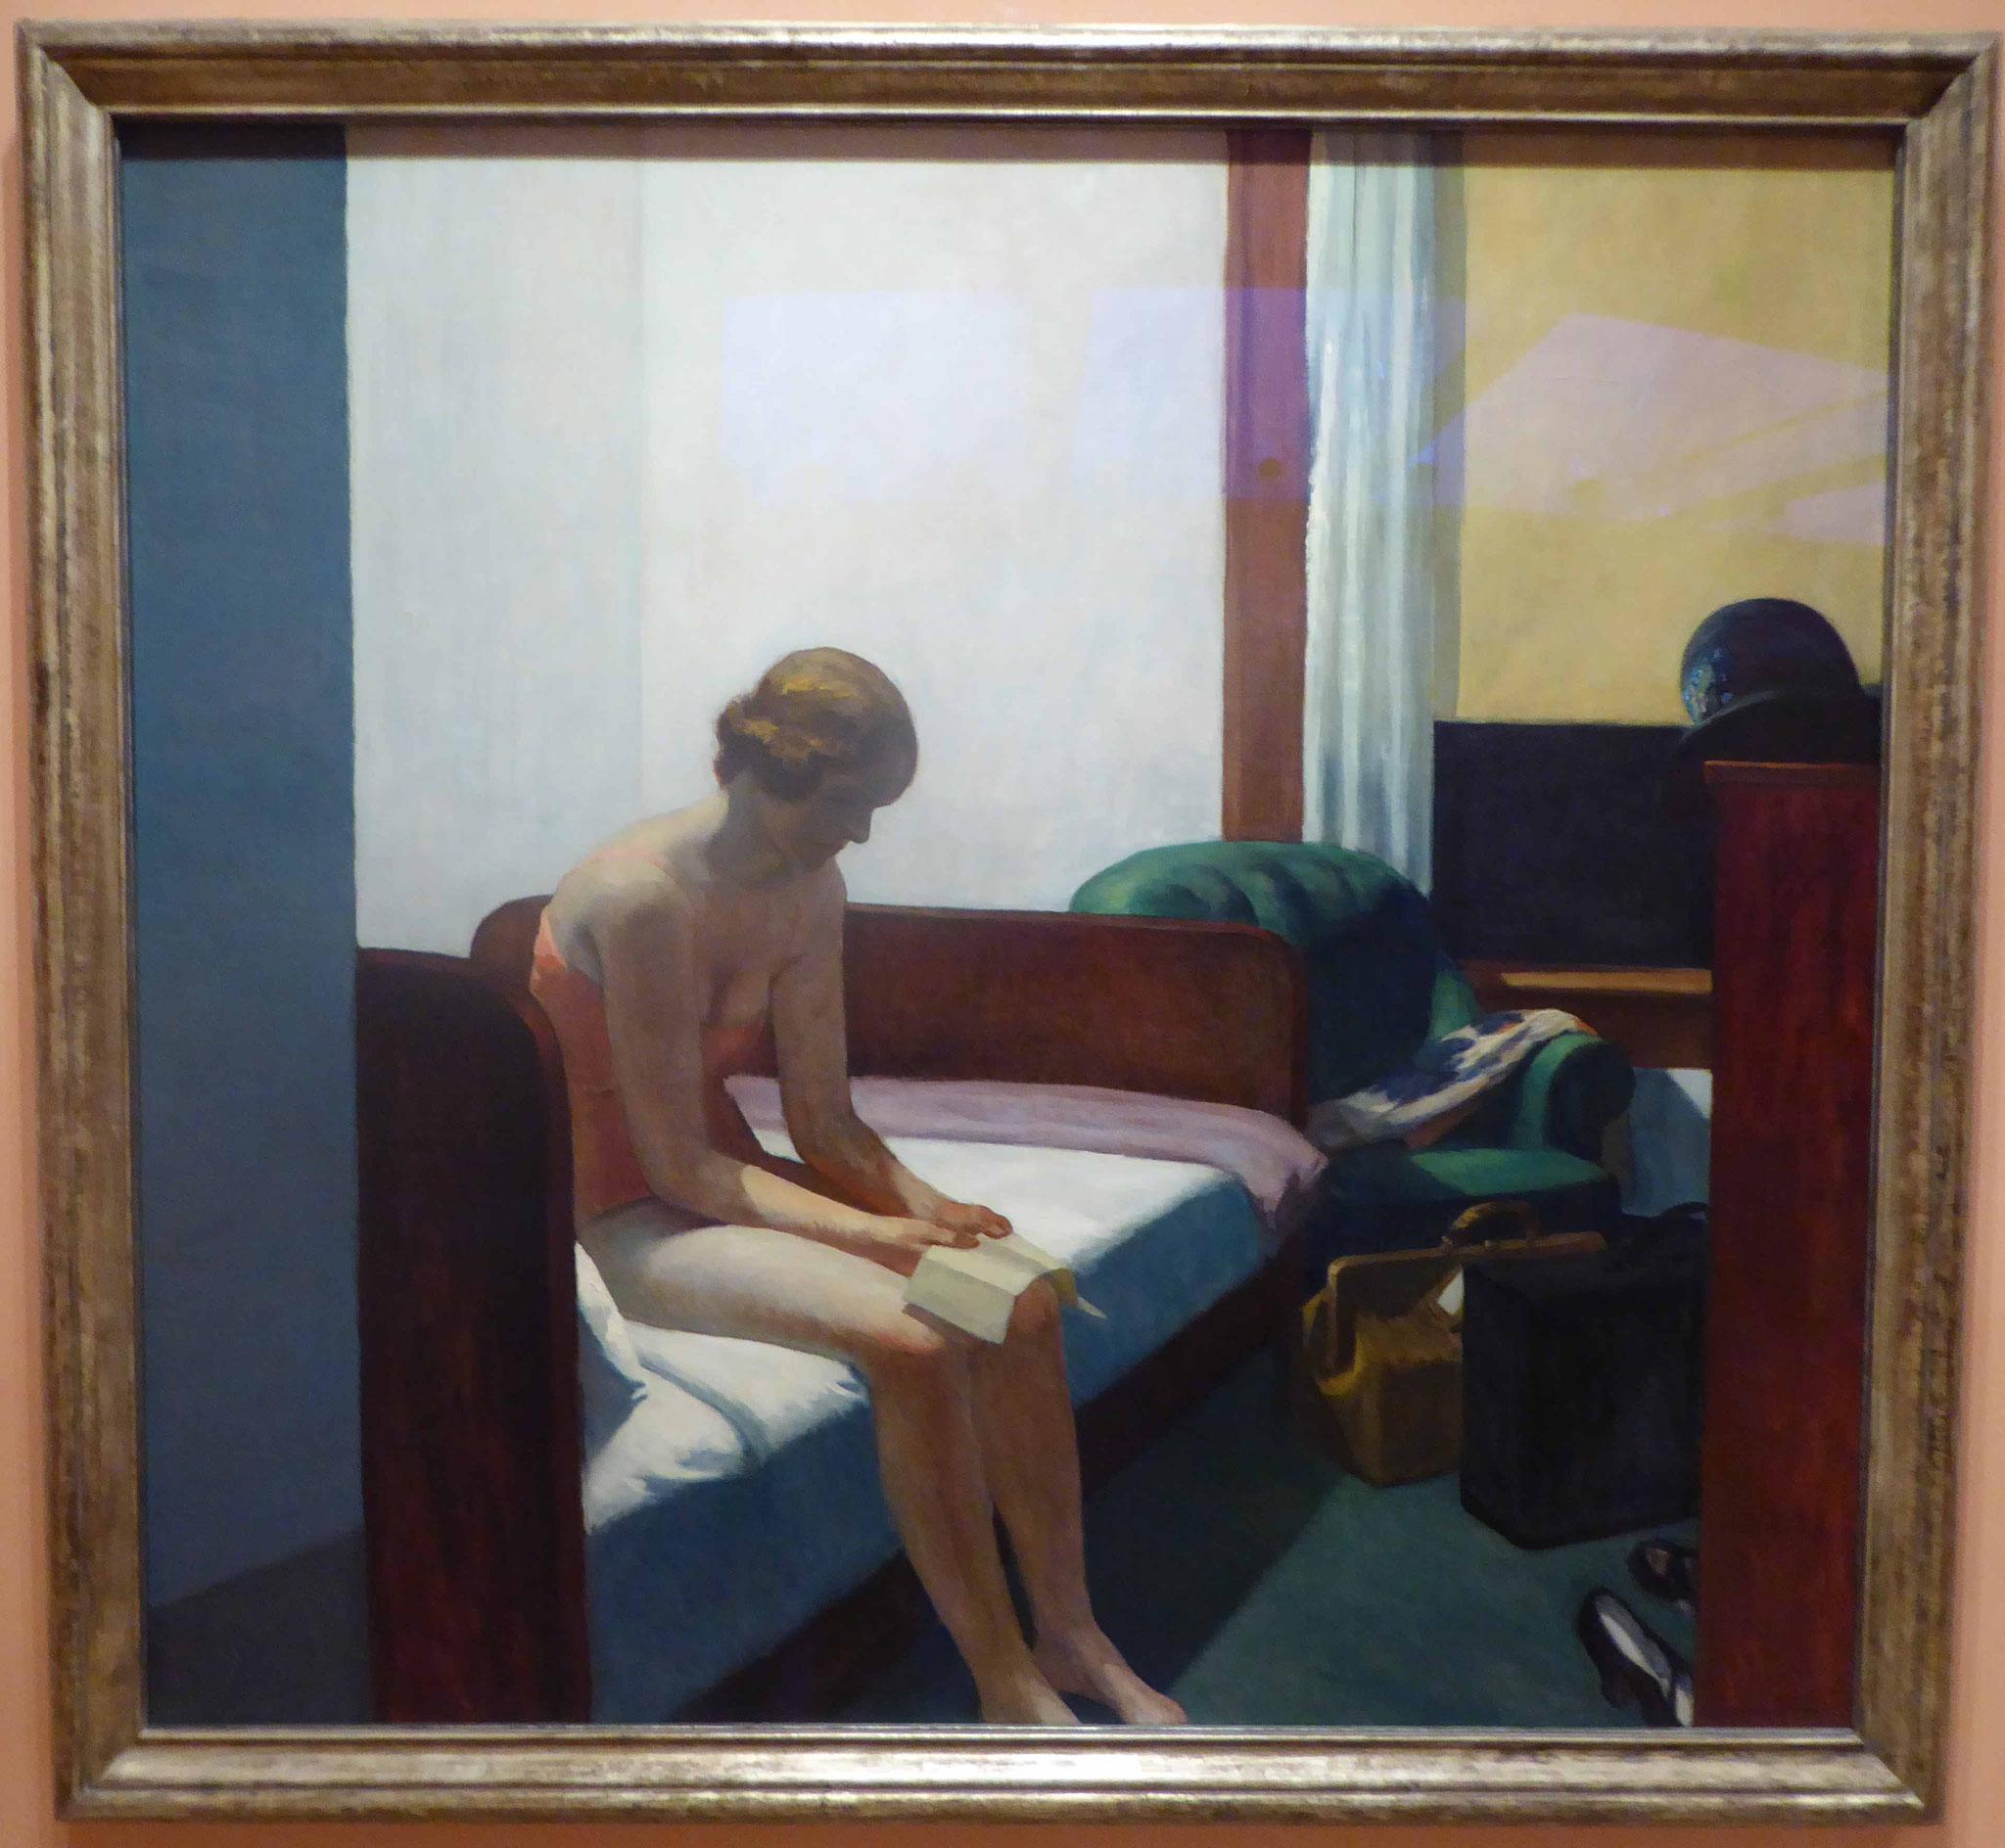 Edward Hopper, Museo Thyssen-Bornemisza, Madrid, Spanien